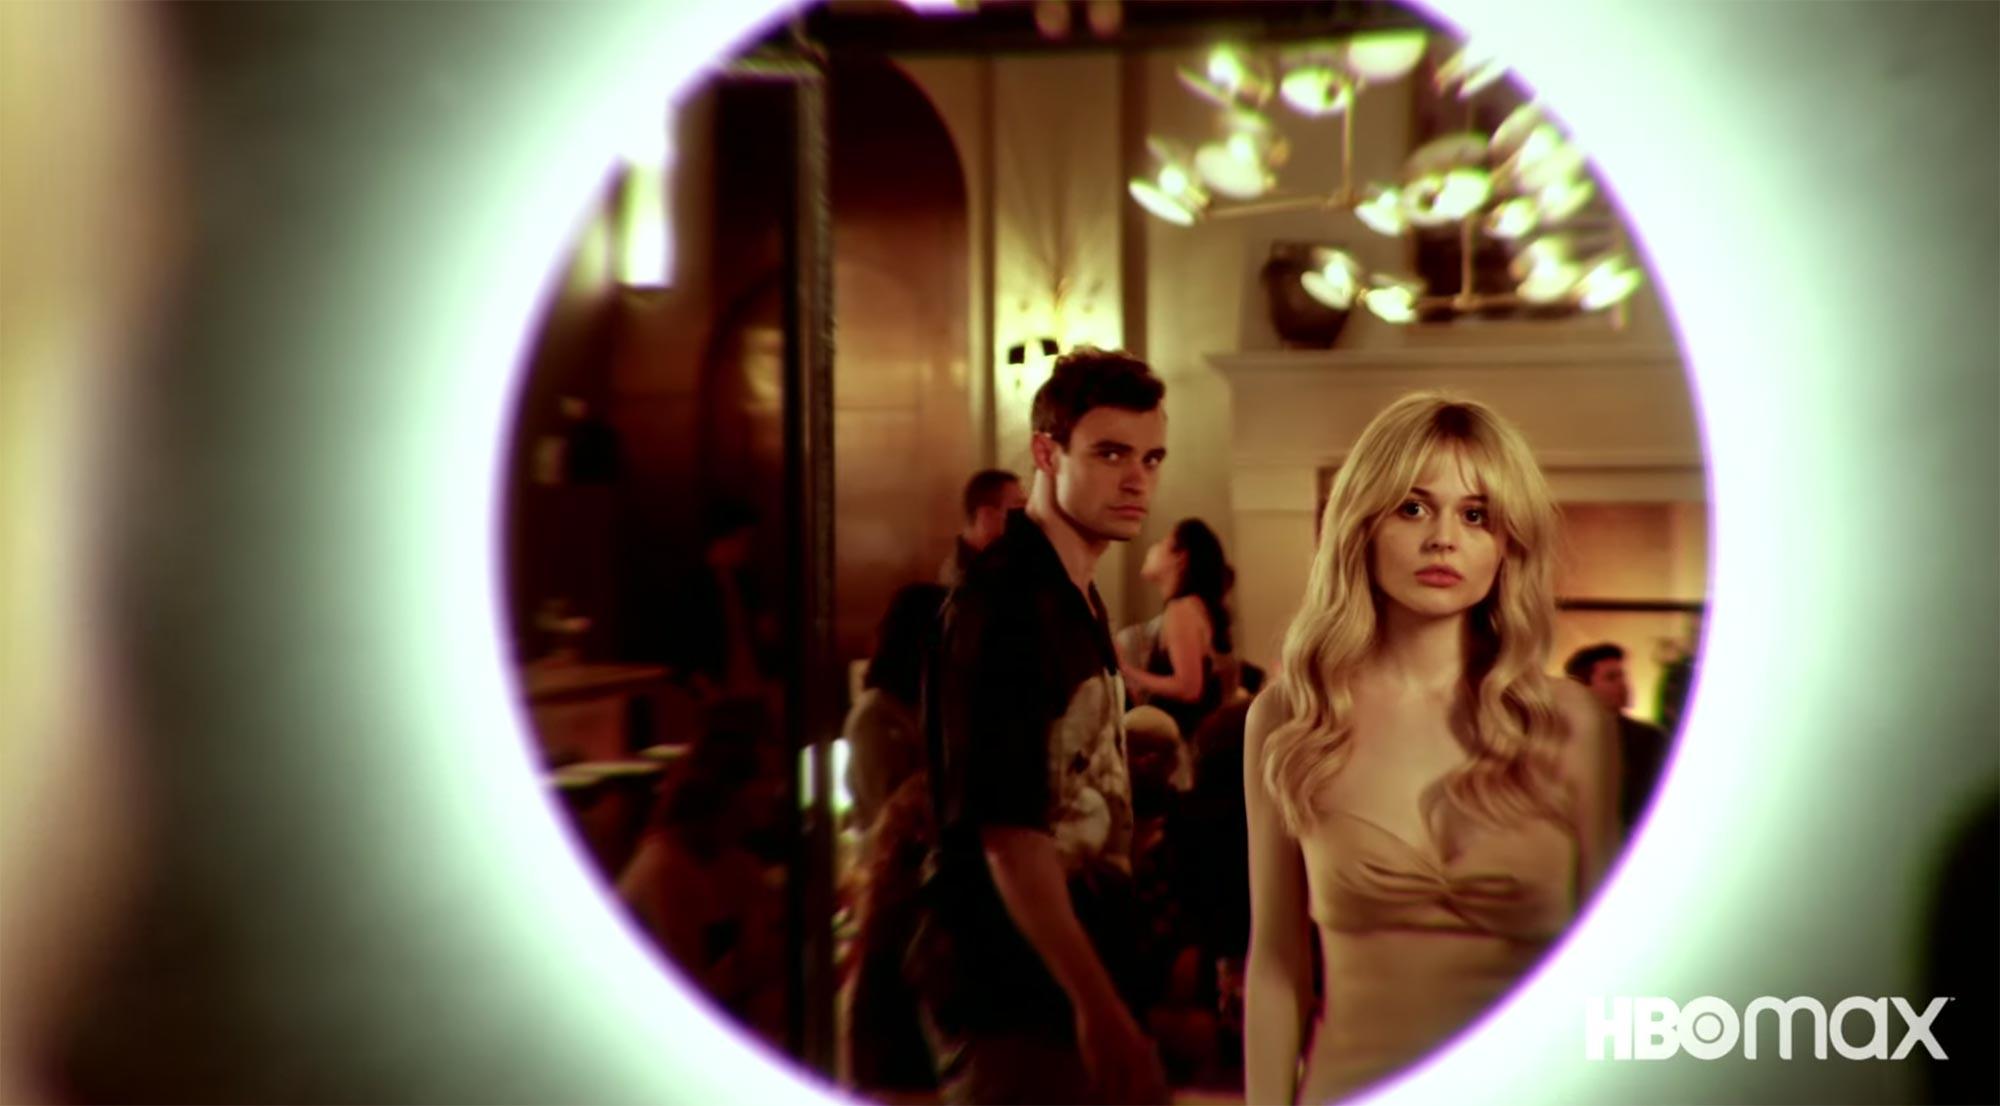 Gossip Girl Season 1A | Official Teaser | HBO Max